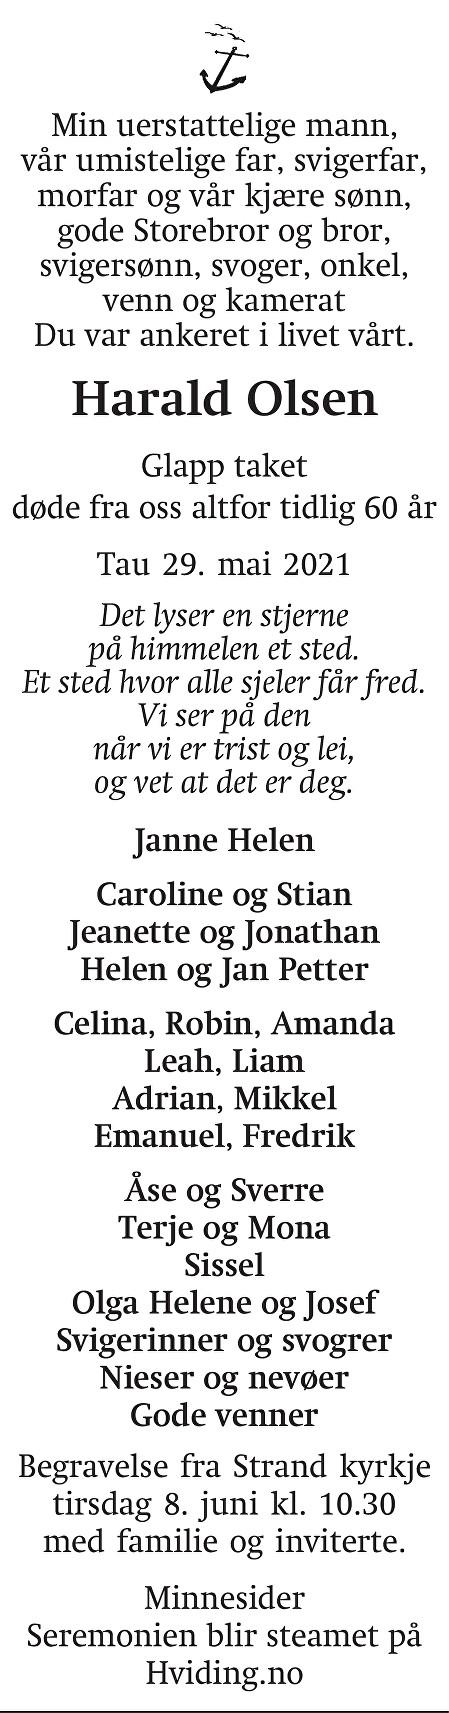 Harald Olsen Dødsannonse